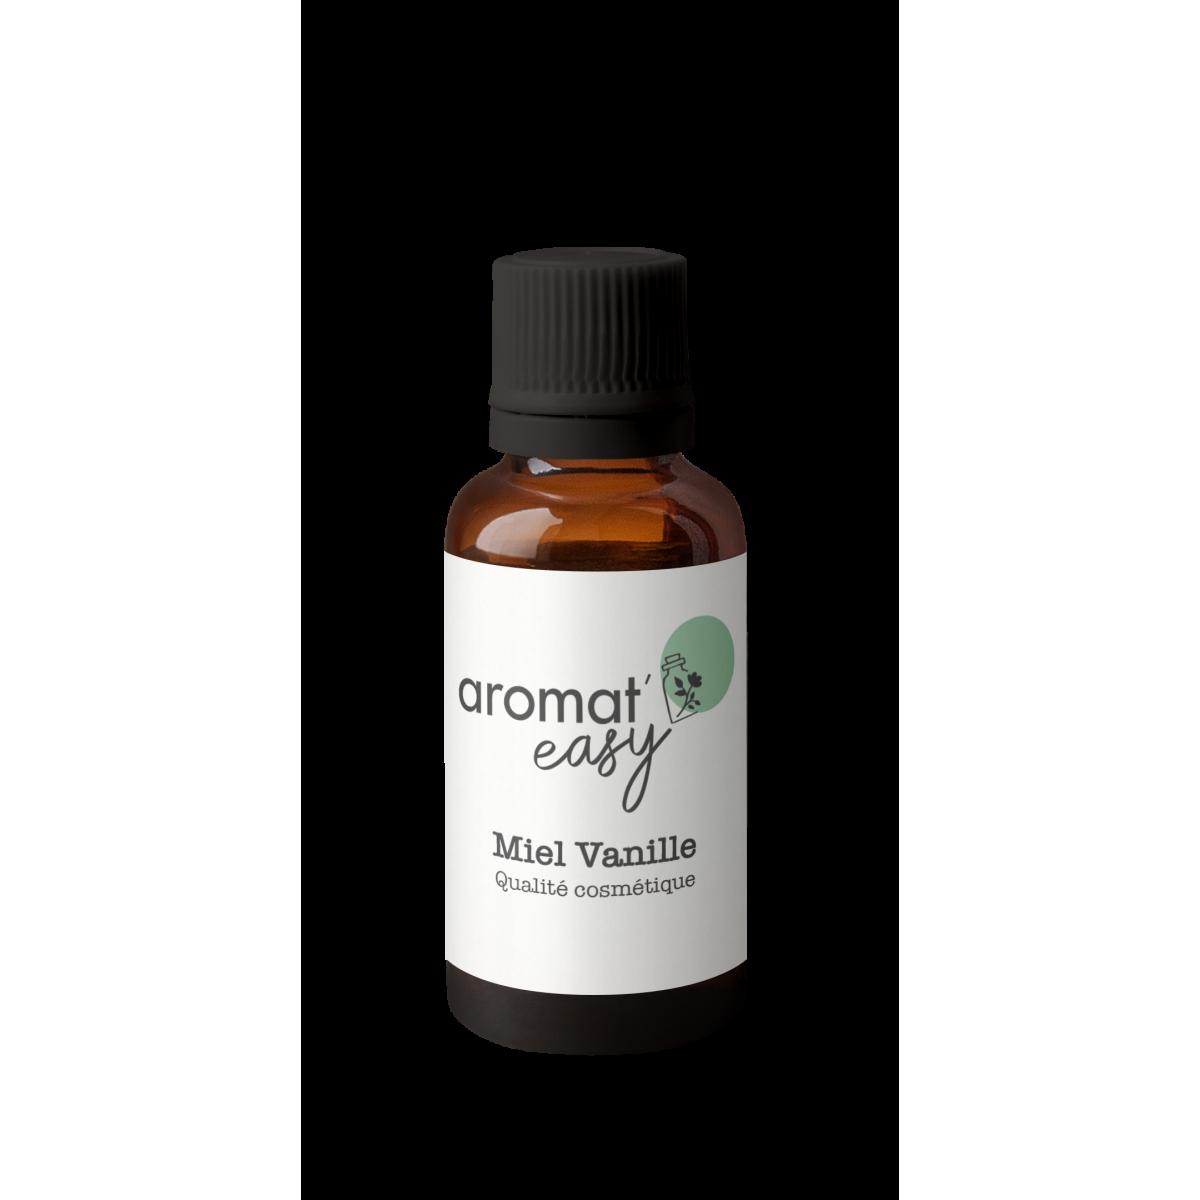 Fragrance Miel Vanille